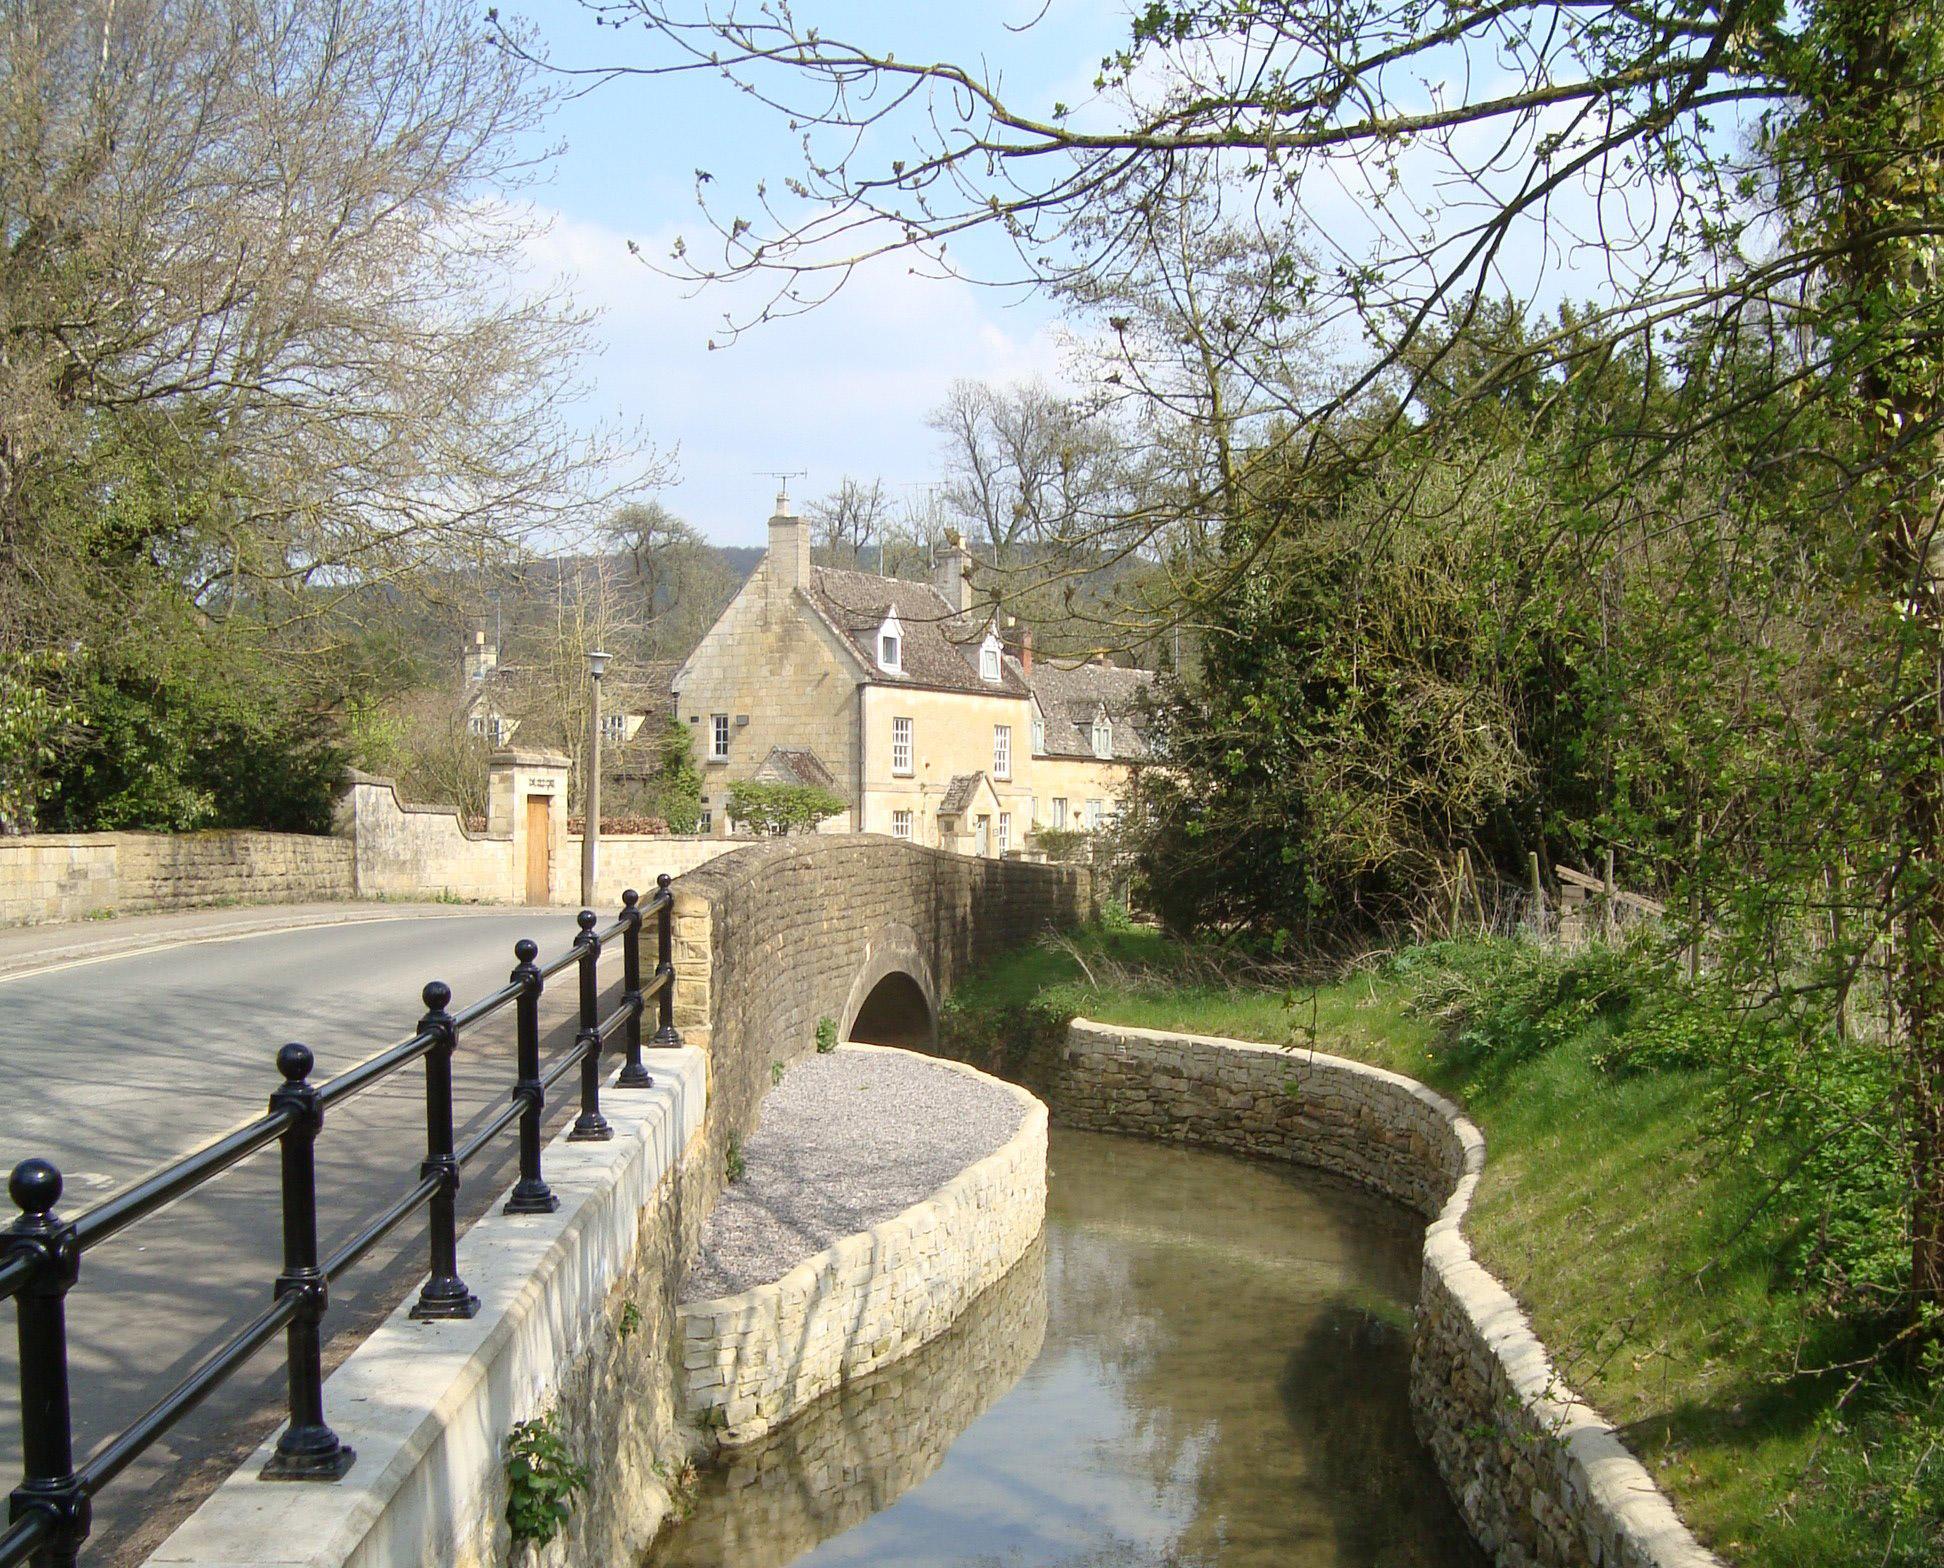 River Isbourne, Castle Street